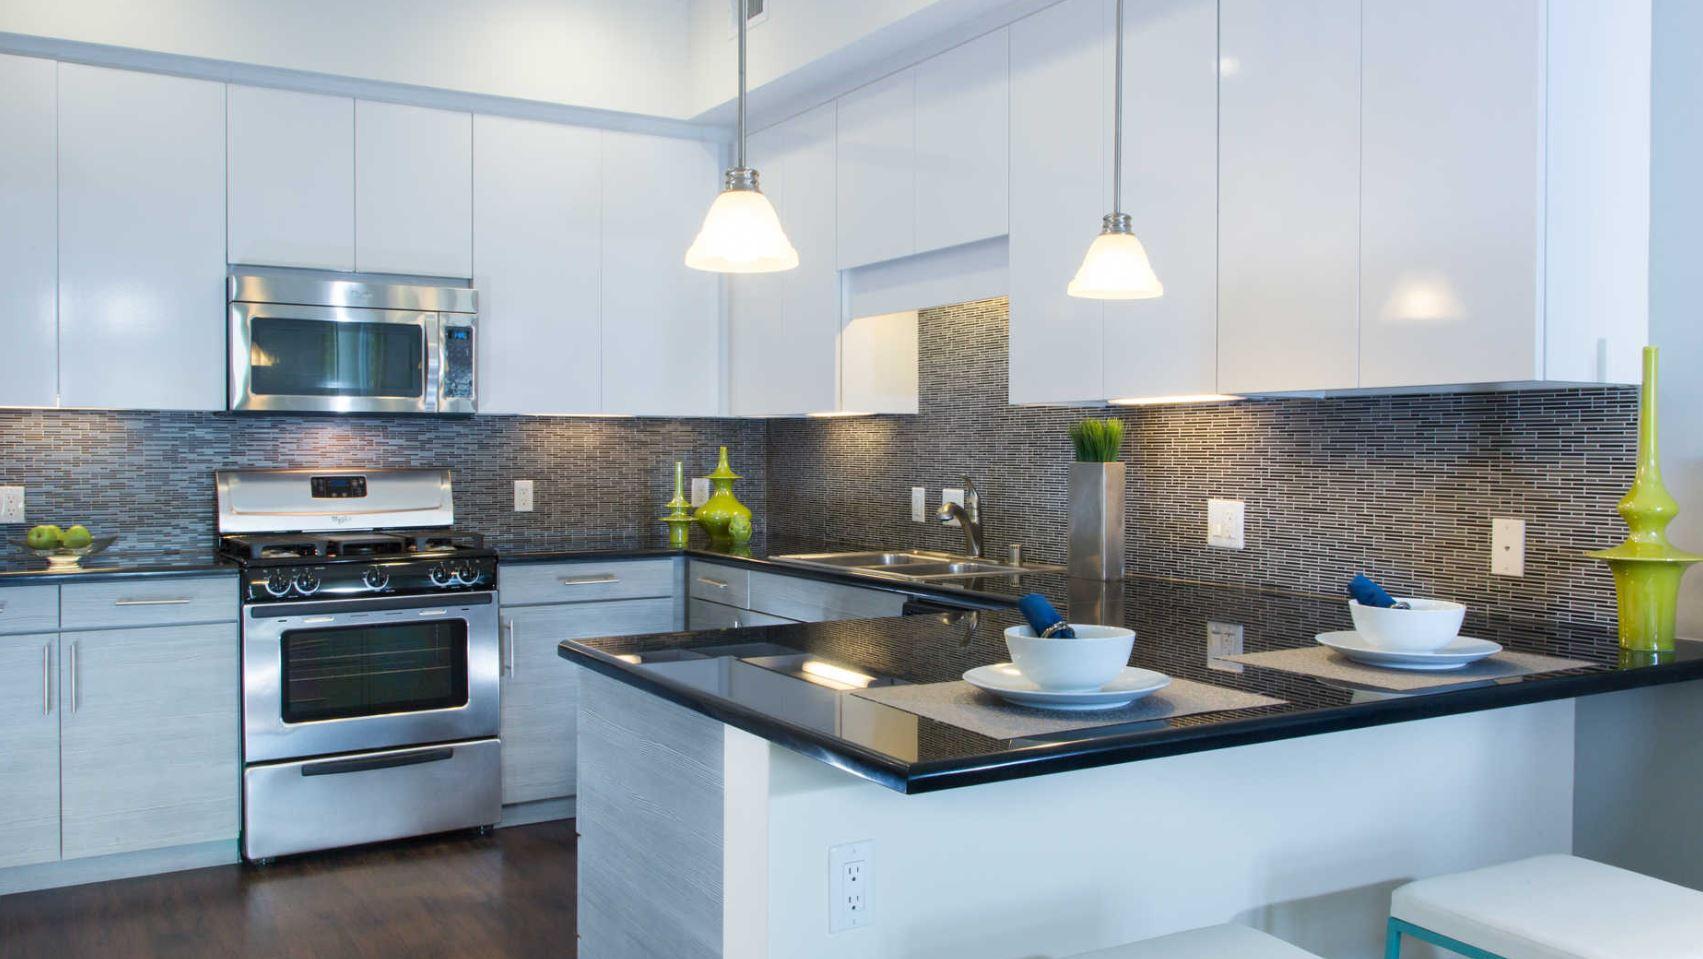 Kitchen at The Domain Apartments, Renaisance, San Jose